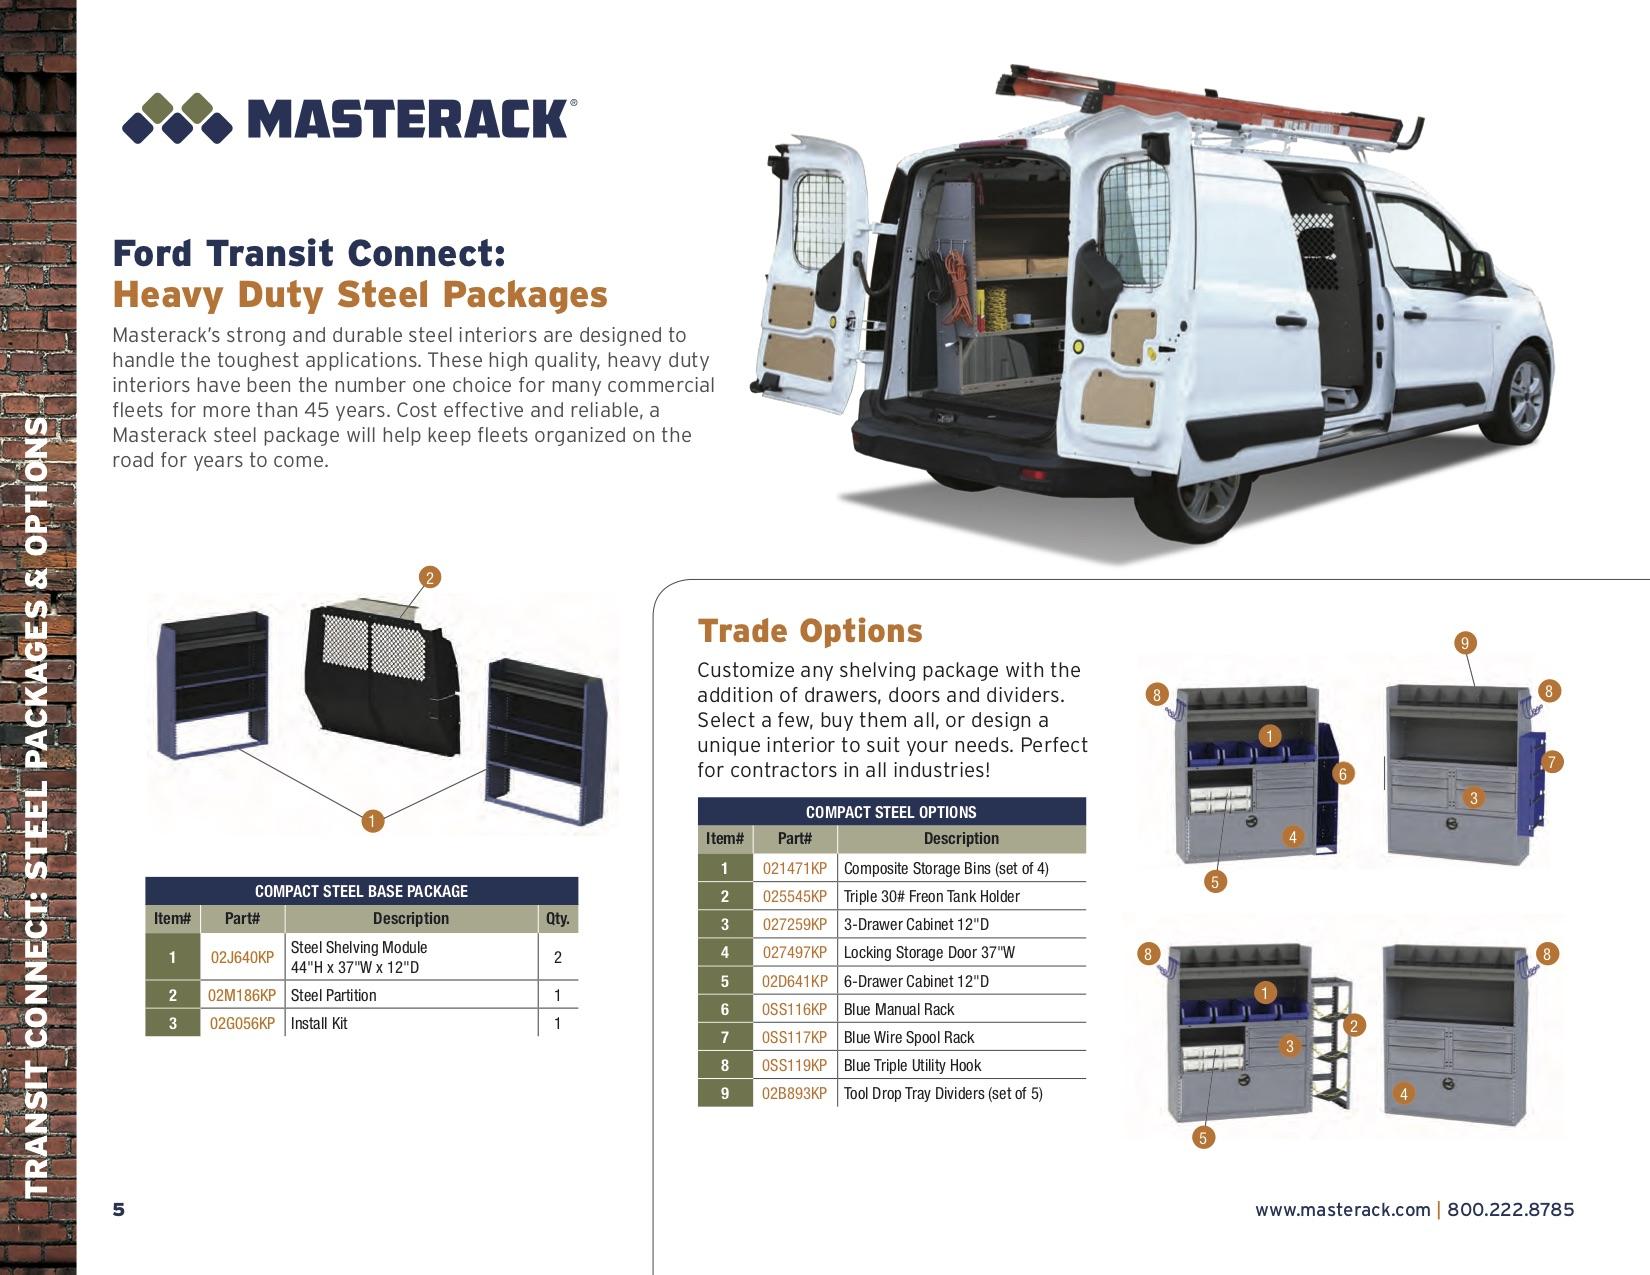 Masterack — Image Graphics